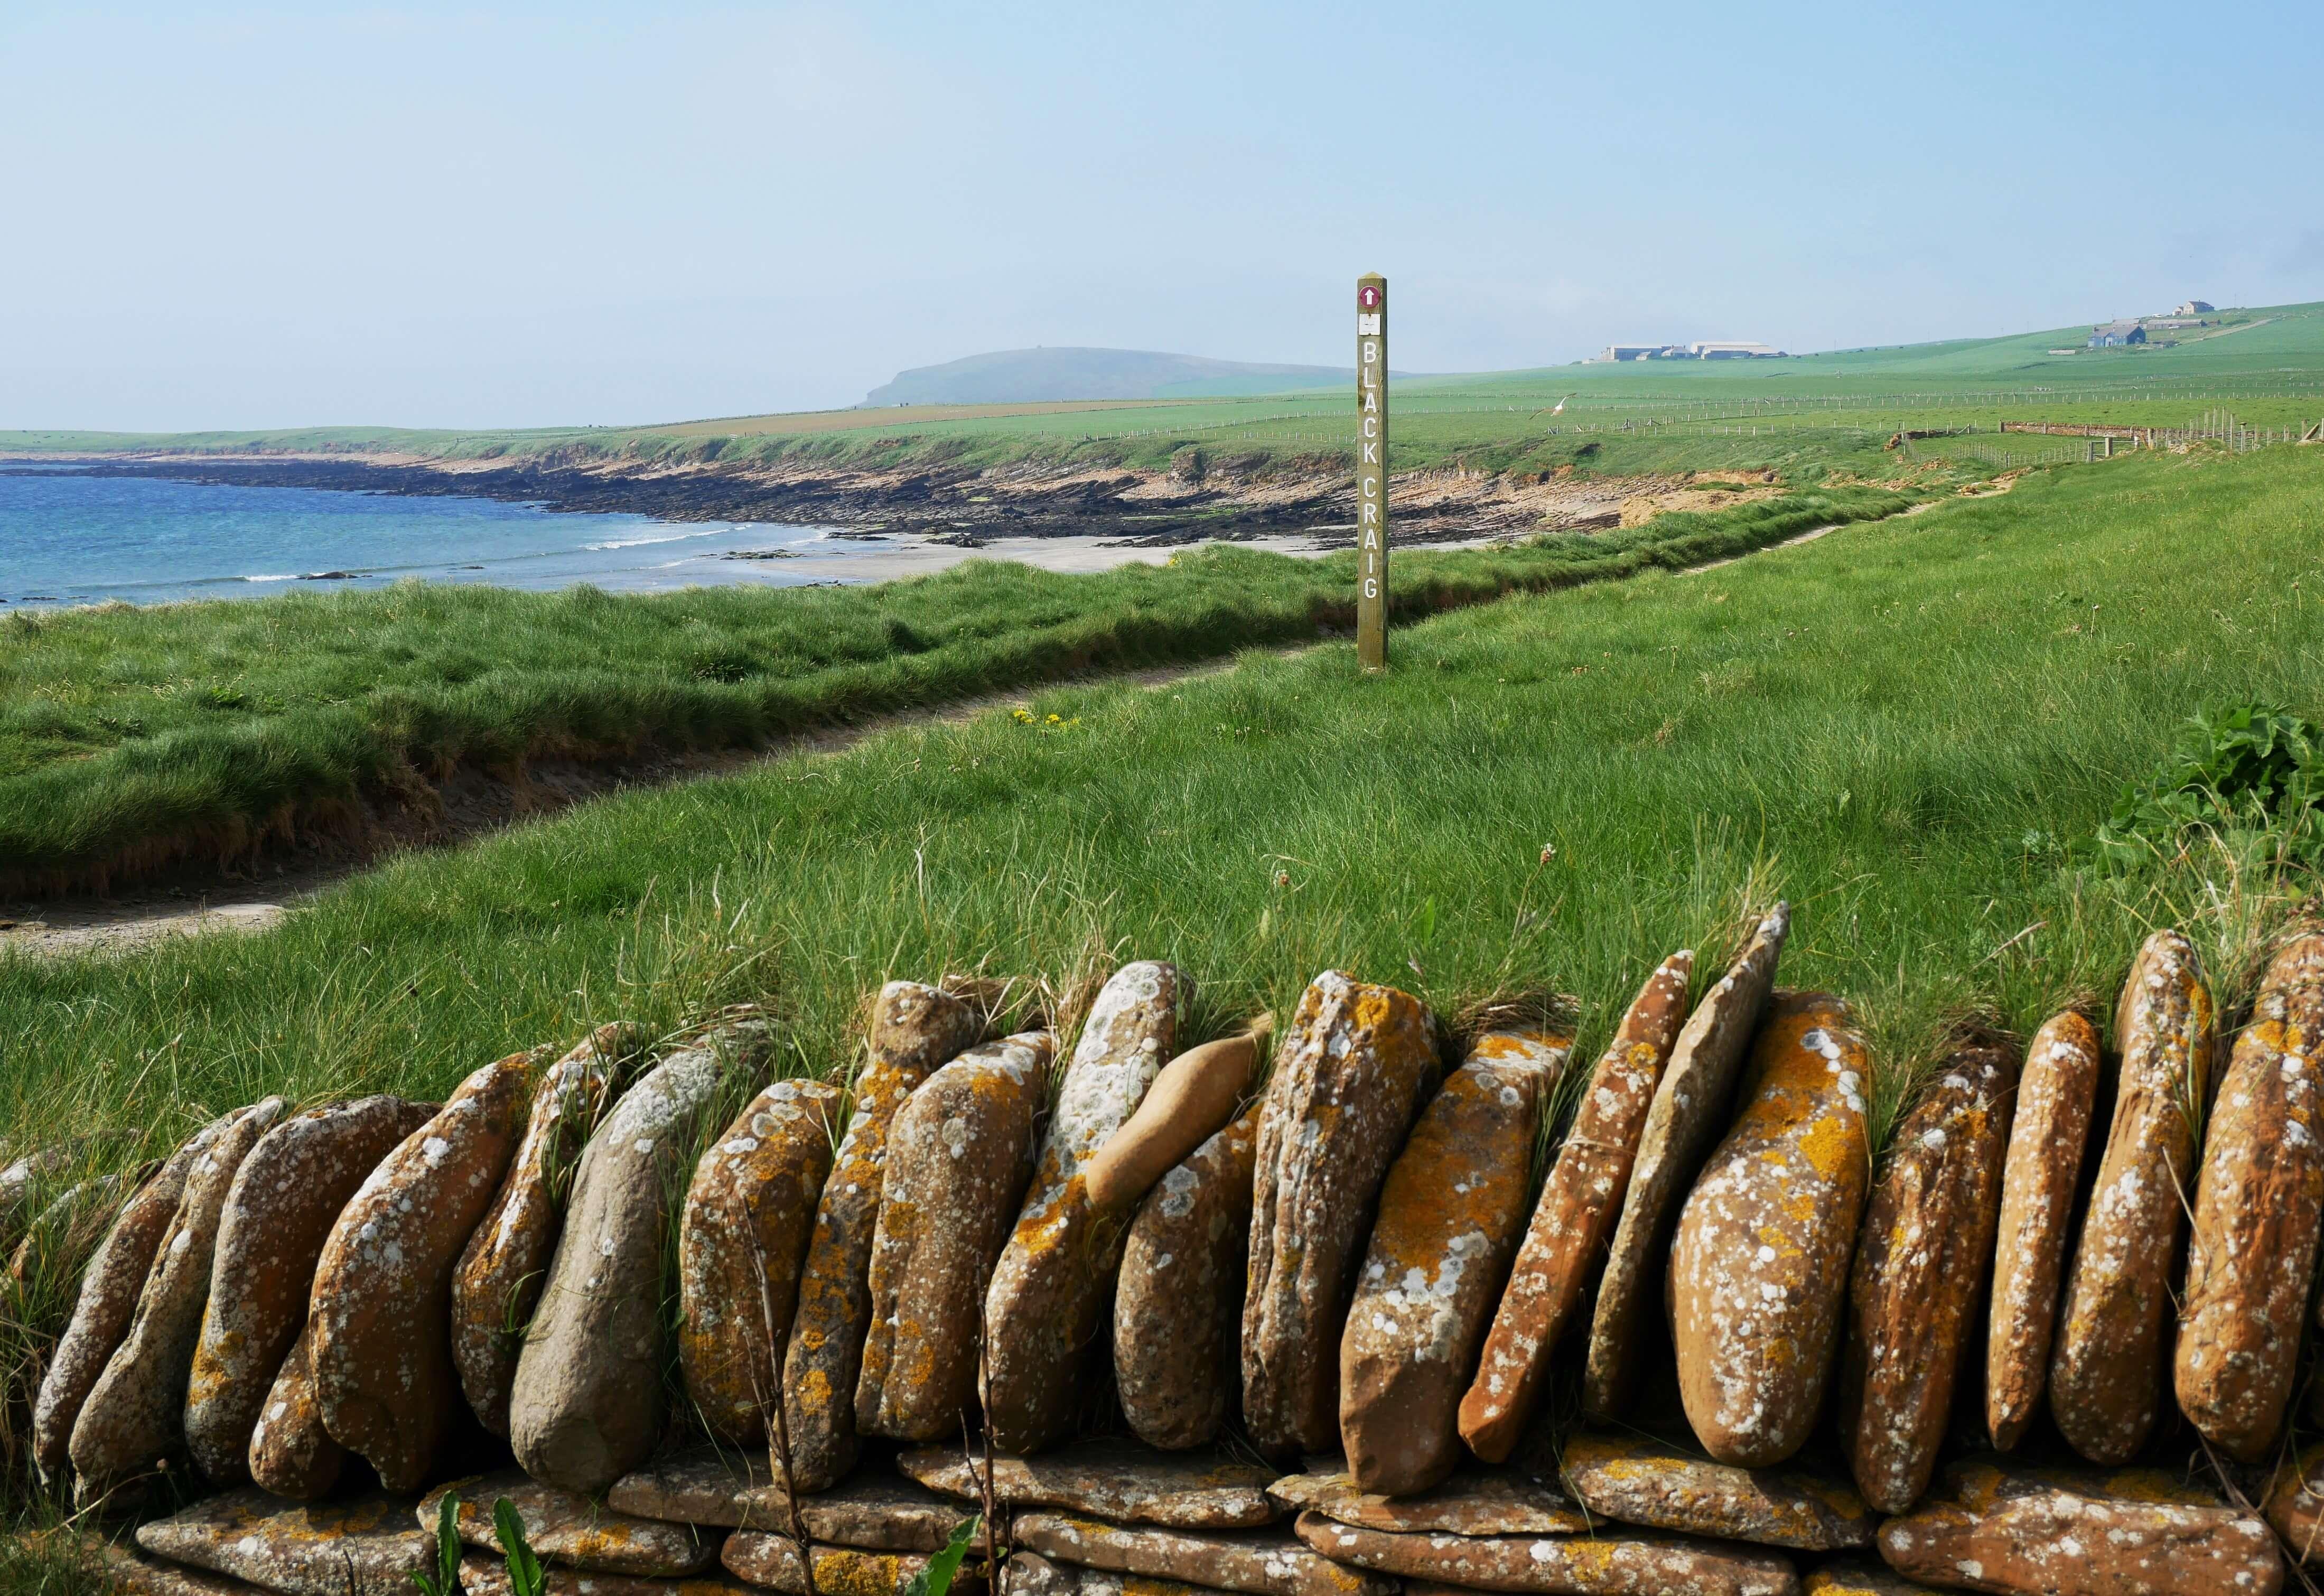 Trail to the Black Craig, Warbeth Beach, Orkney Islands, Scotland - Orkneyology.com